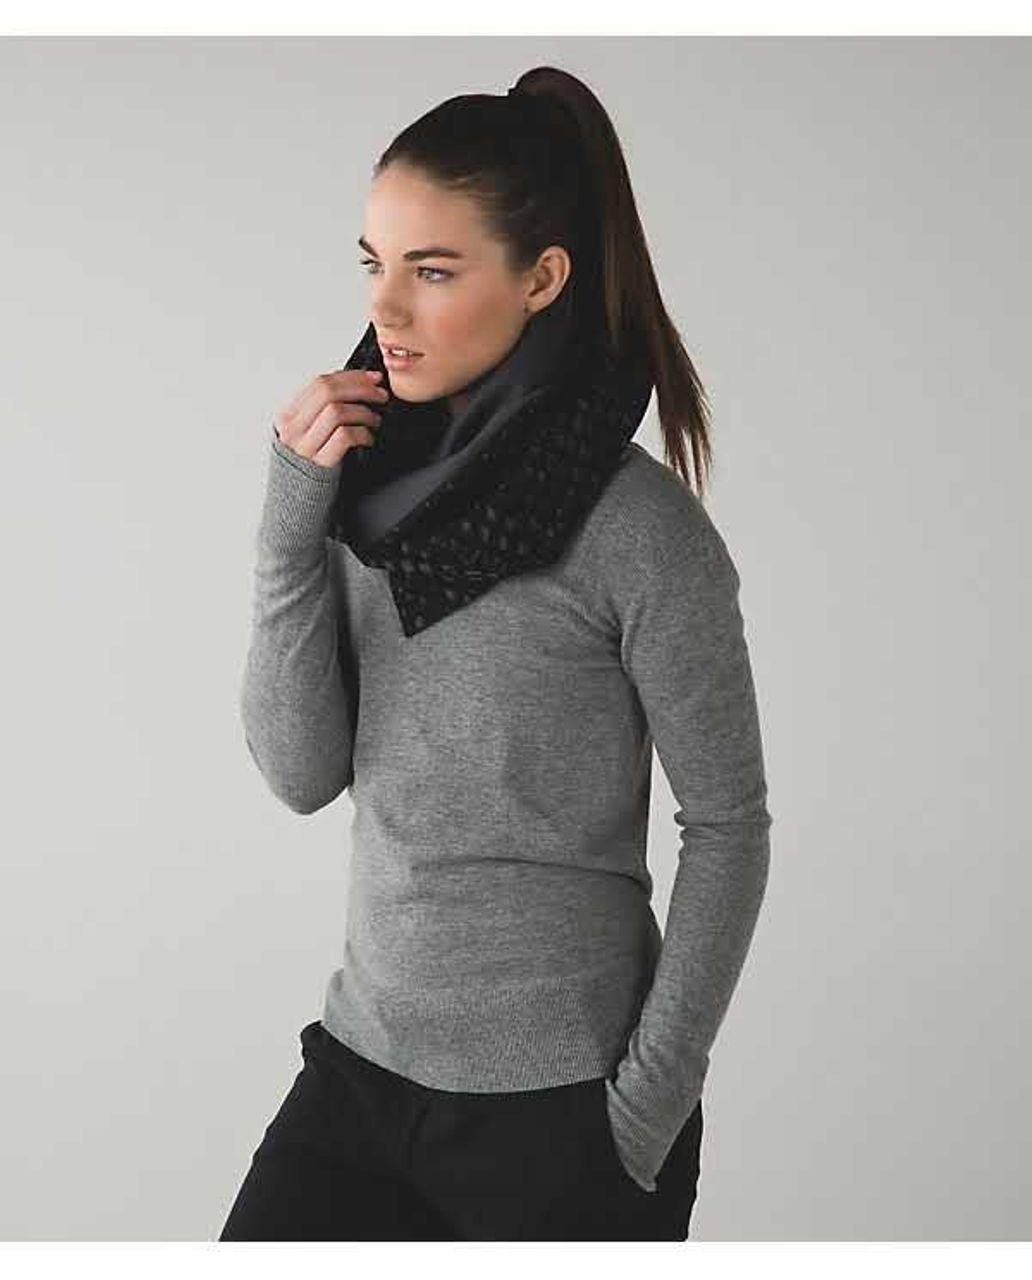 Lululemon Vinyasa Scarf *Fleece - Simply Lace Play Dark Slate Black / Dark Slate